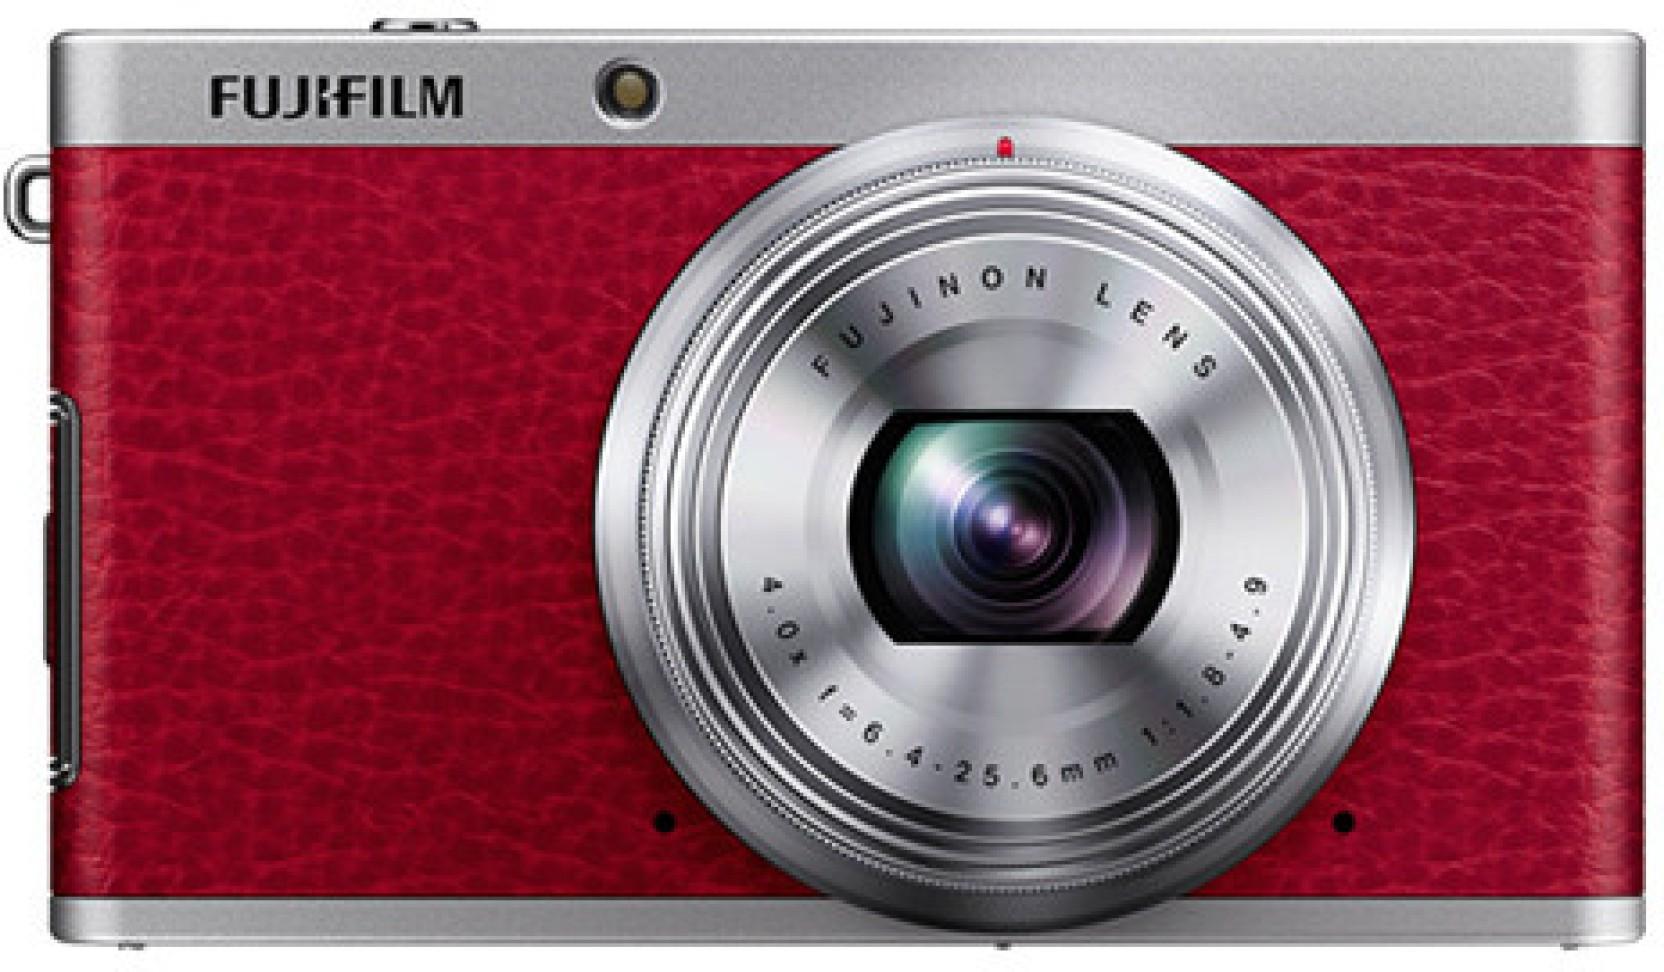 Jual Murah Buy Fujifilm X F1 Point Shoot Camera At Best Update 2018 T20 Kit Xf18 55mmblack Instax Share Sp2 Pwp Xf 35mm F 2 T2 Kamera Mirrorless Body Only